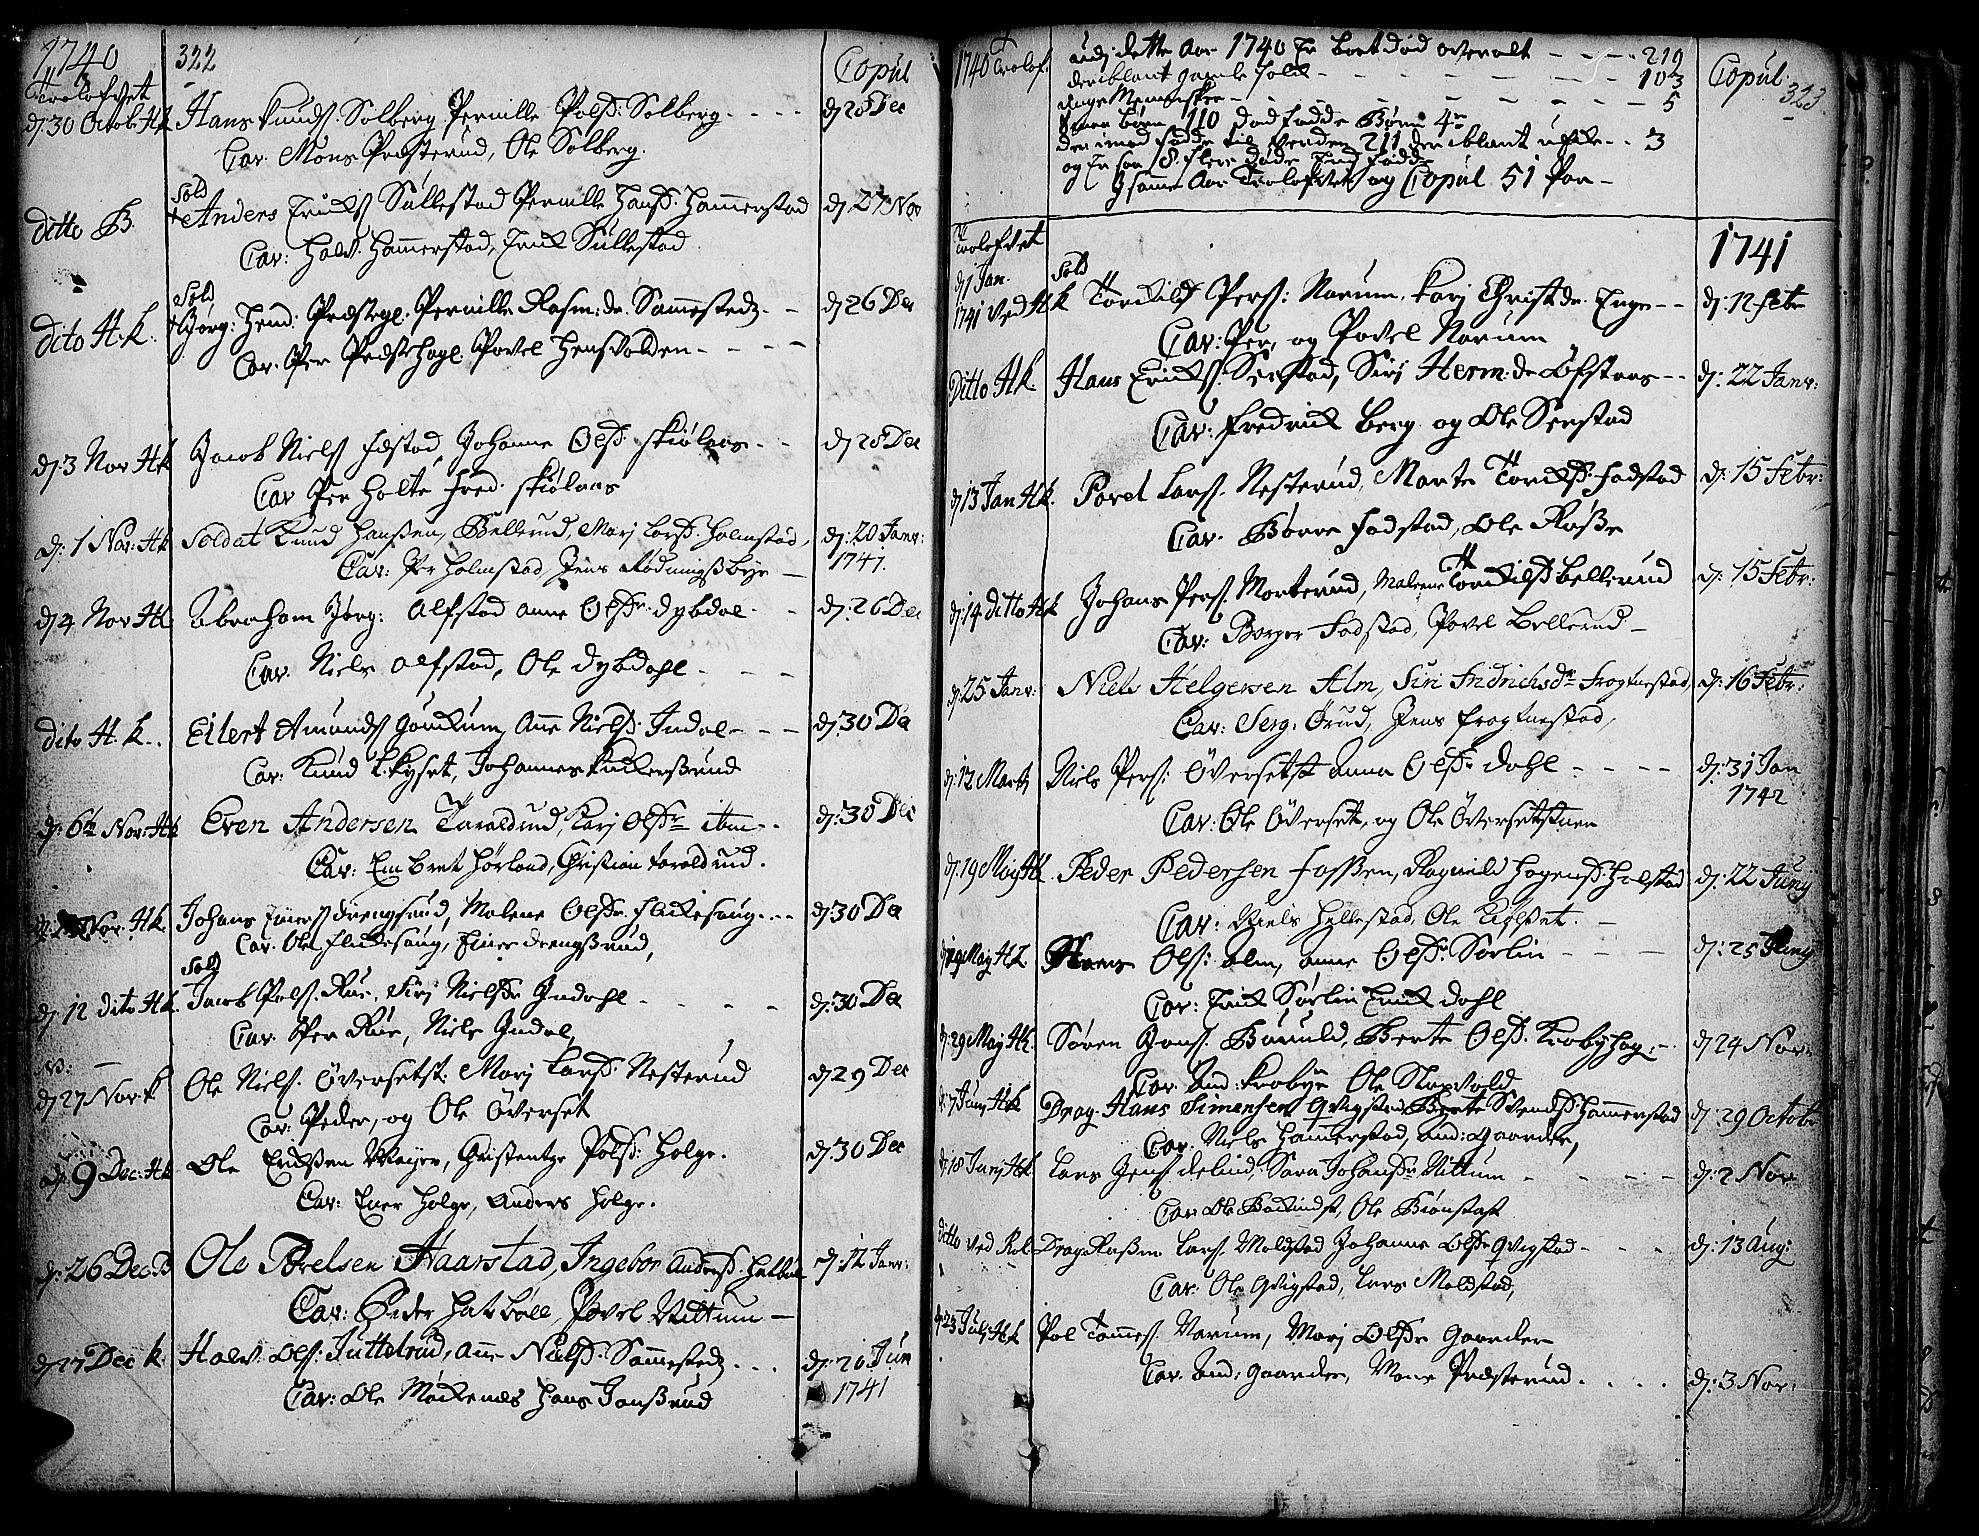 SAH, Toten prestekontor, Ministerialbok nr. 3, 1734-1751, s. 322-323